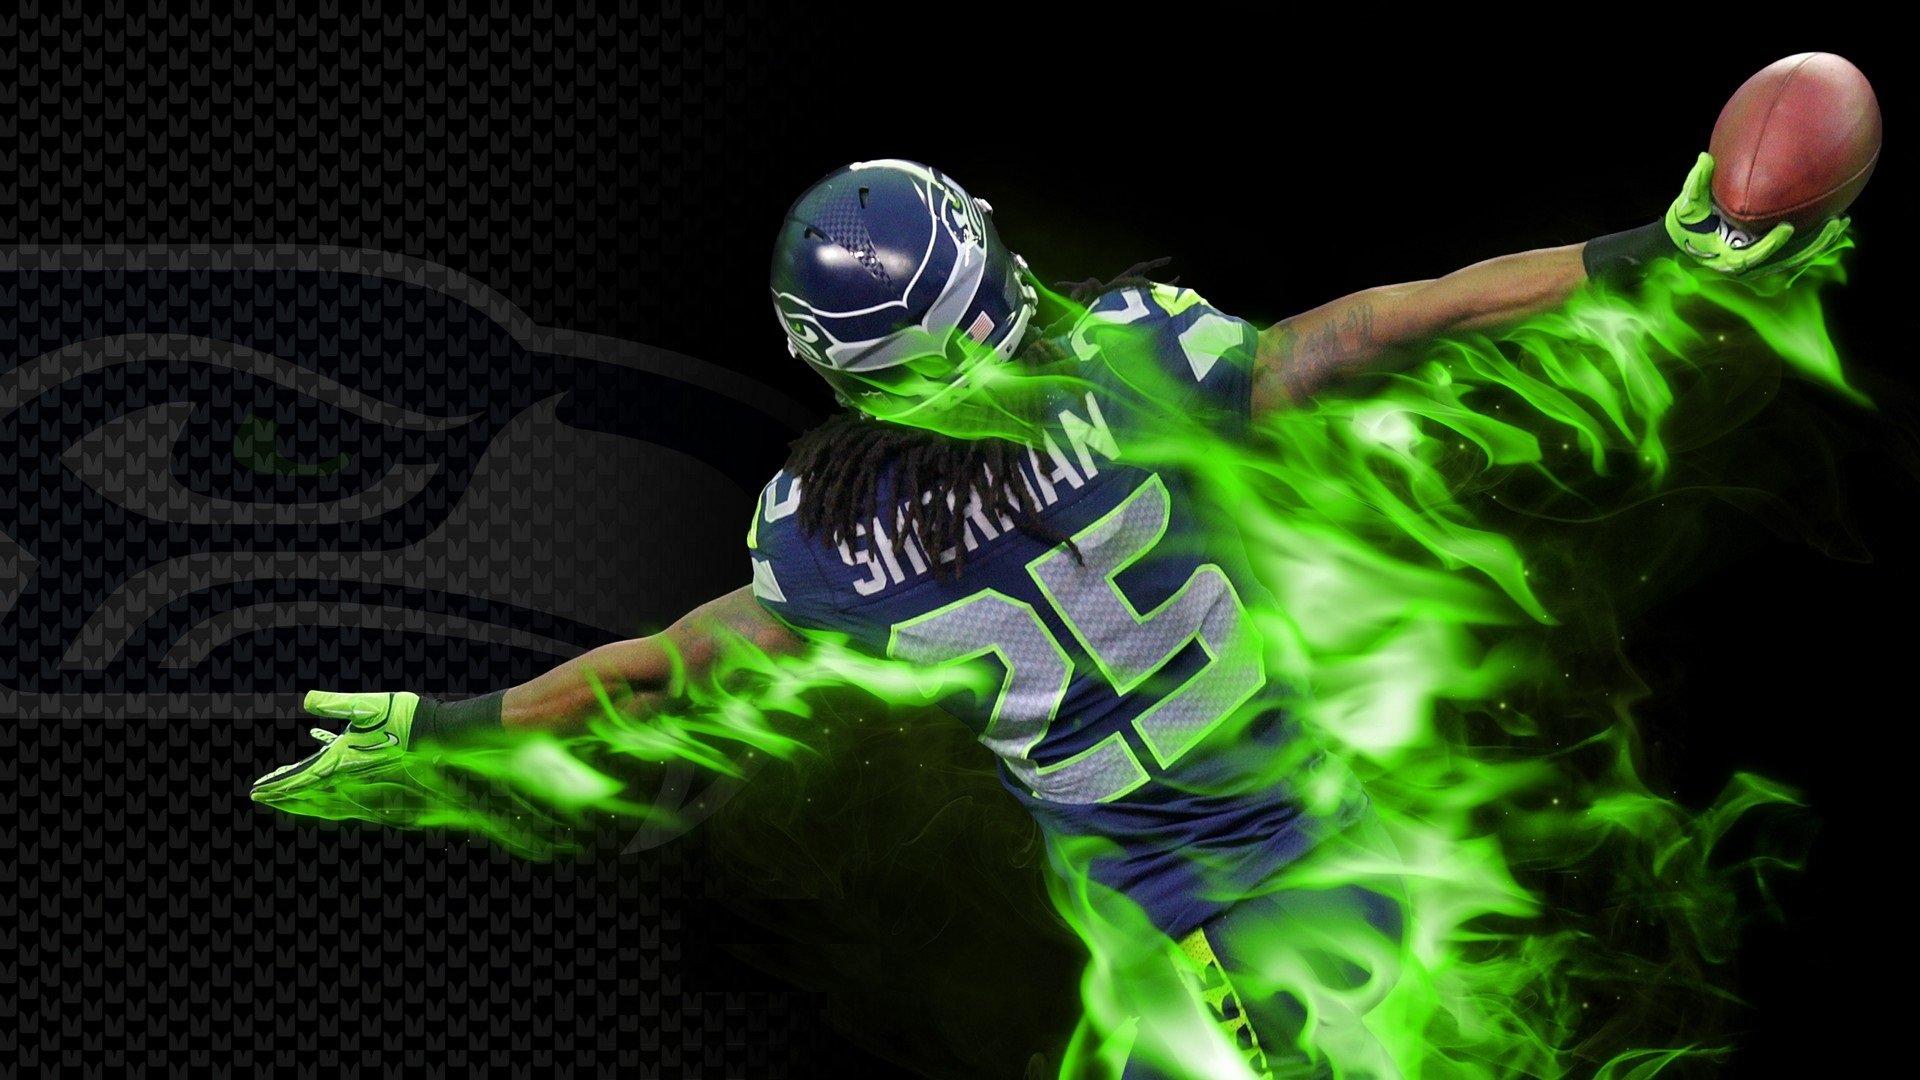 HD Seattle Seahawks Wallpapers 2020 NFL Football Wallpapers 1920x1080